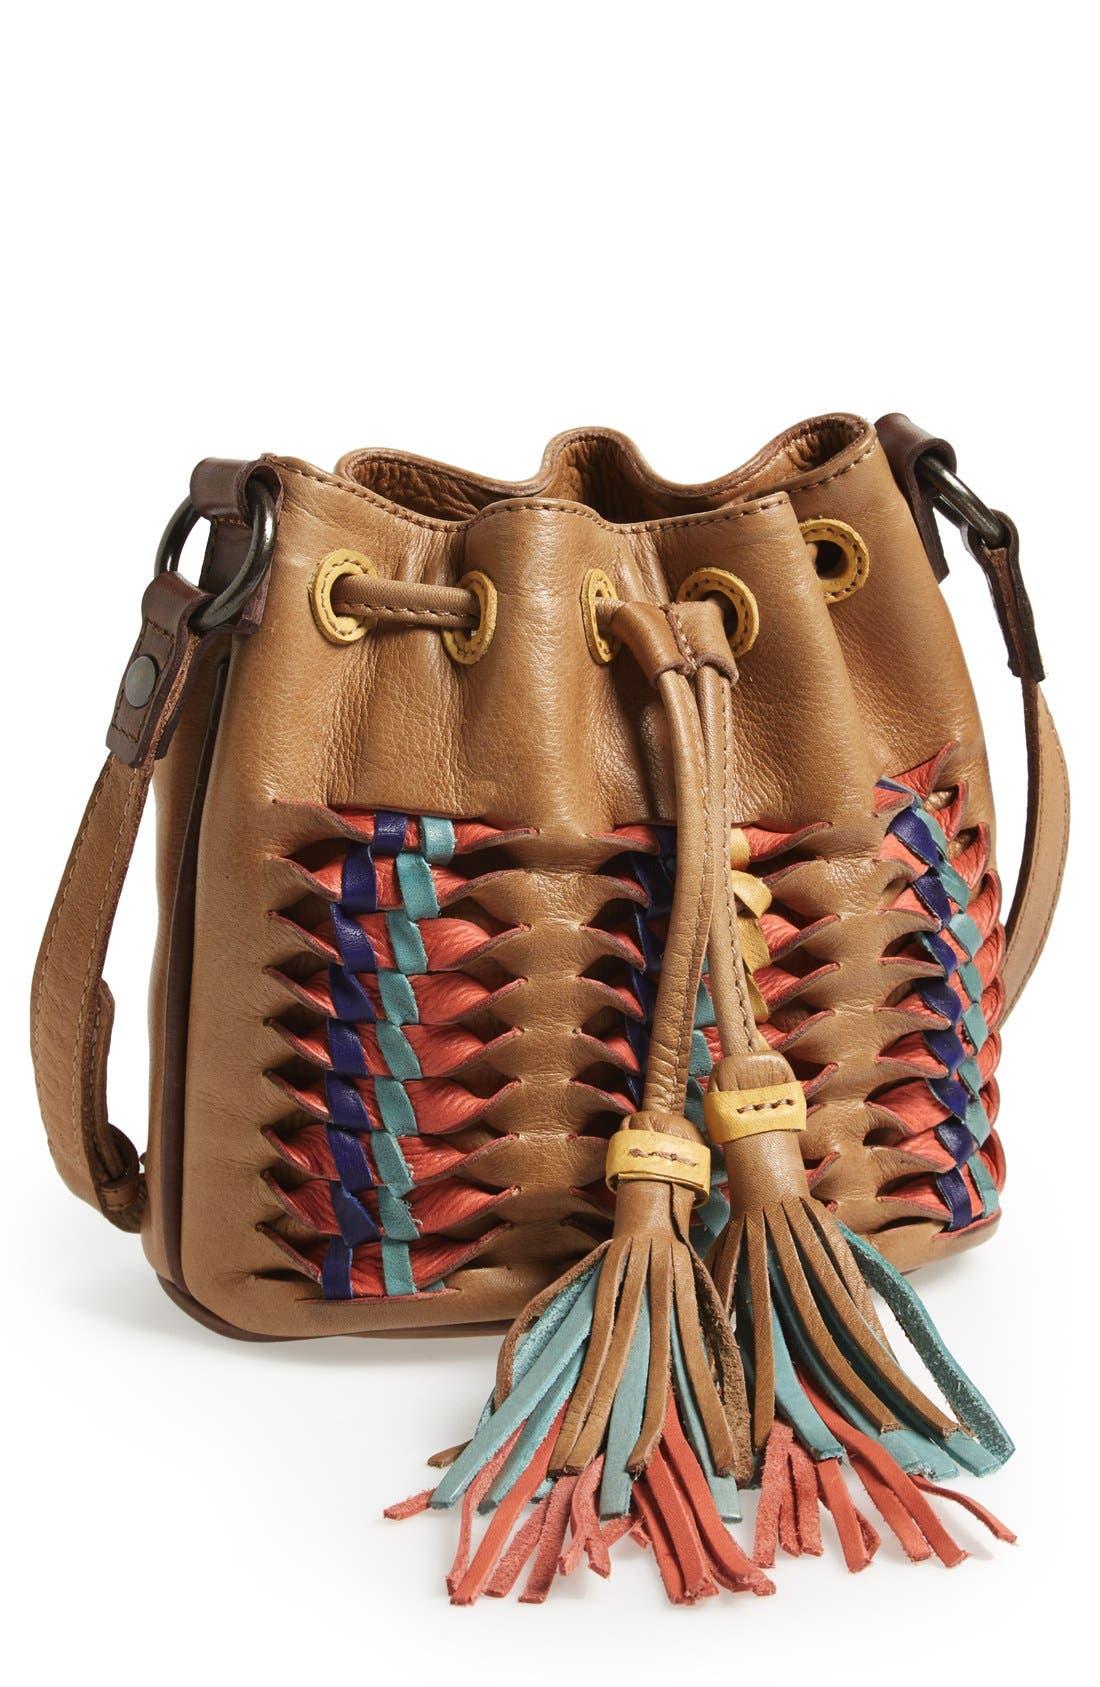 Alternate Image 1 Selected - Frye 'Heather' Leather Bucket Bag